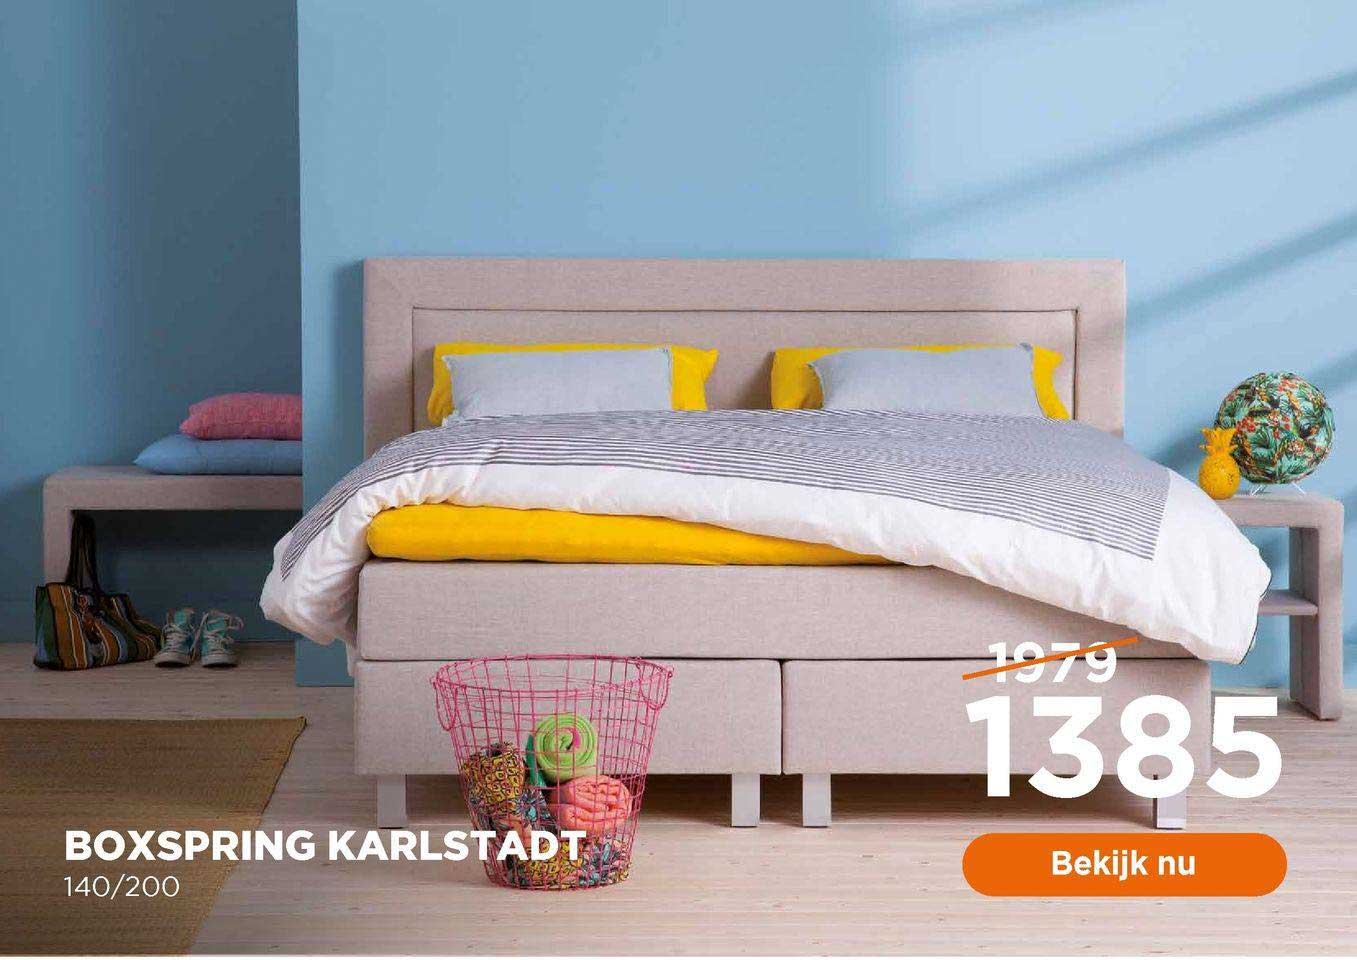 TotaalBED Boxspring Karlstadt 140-200